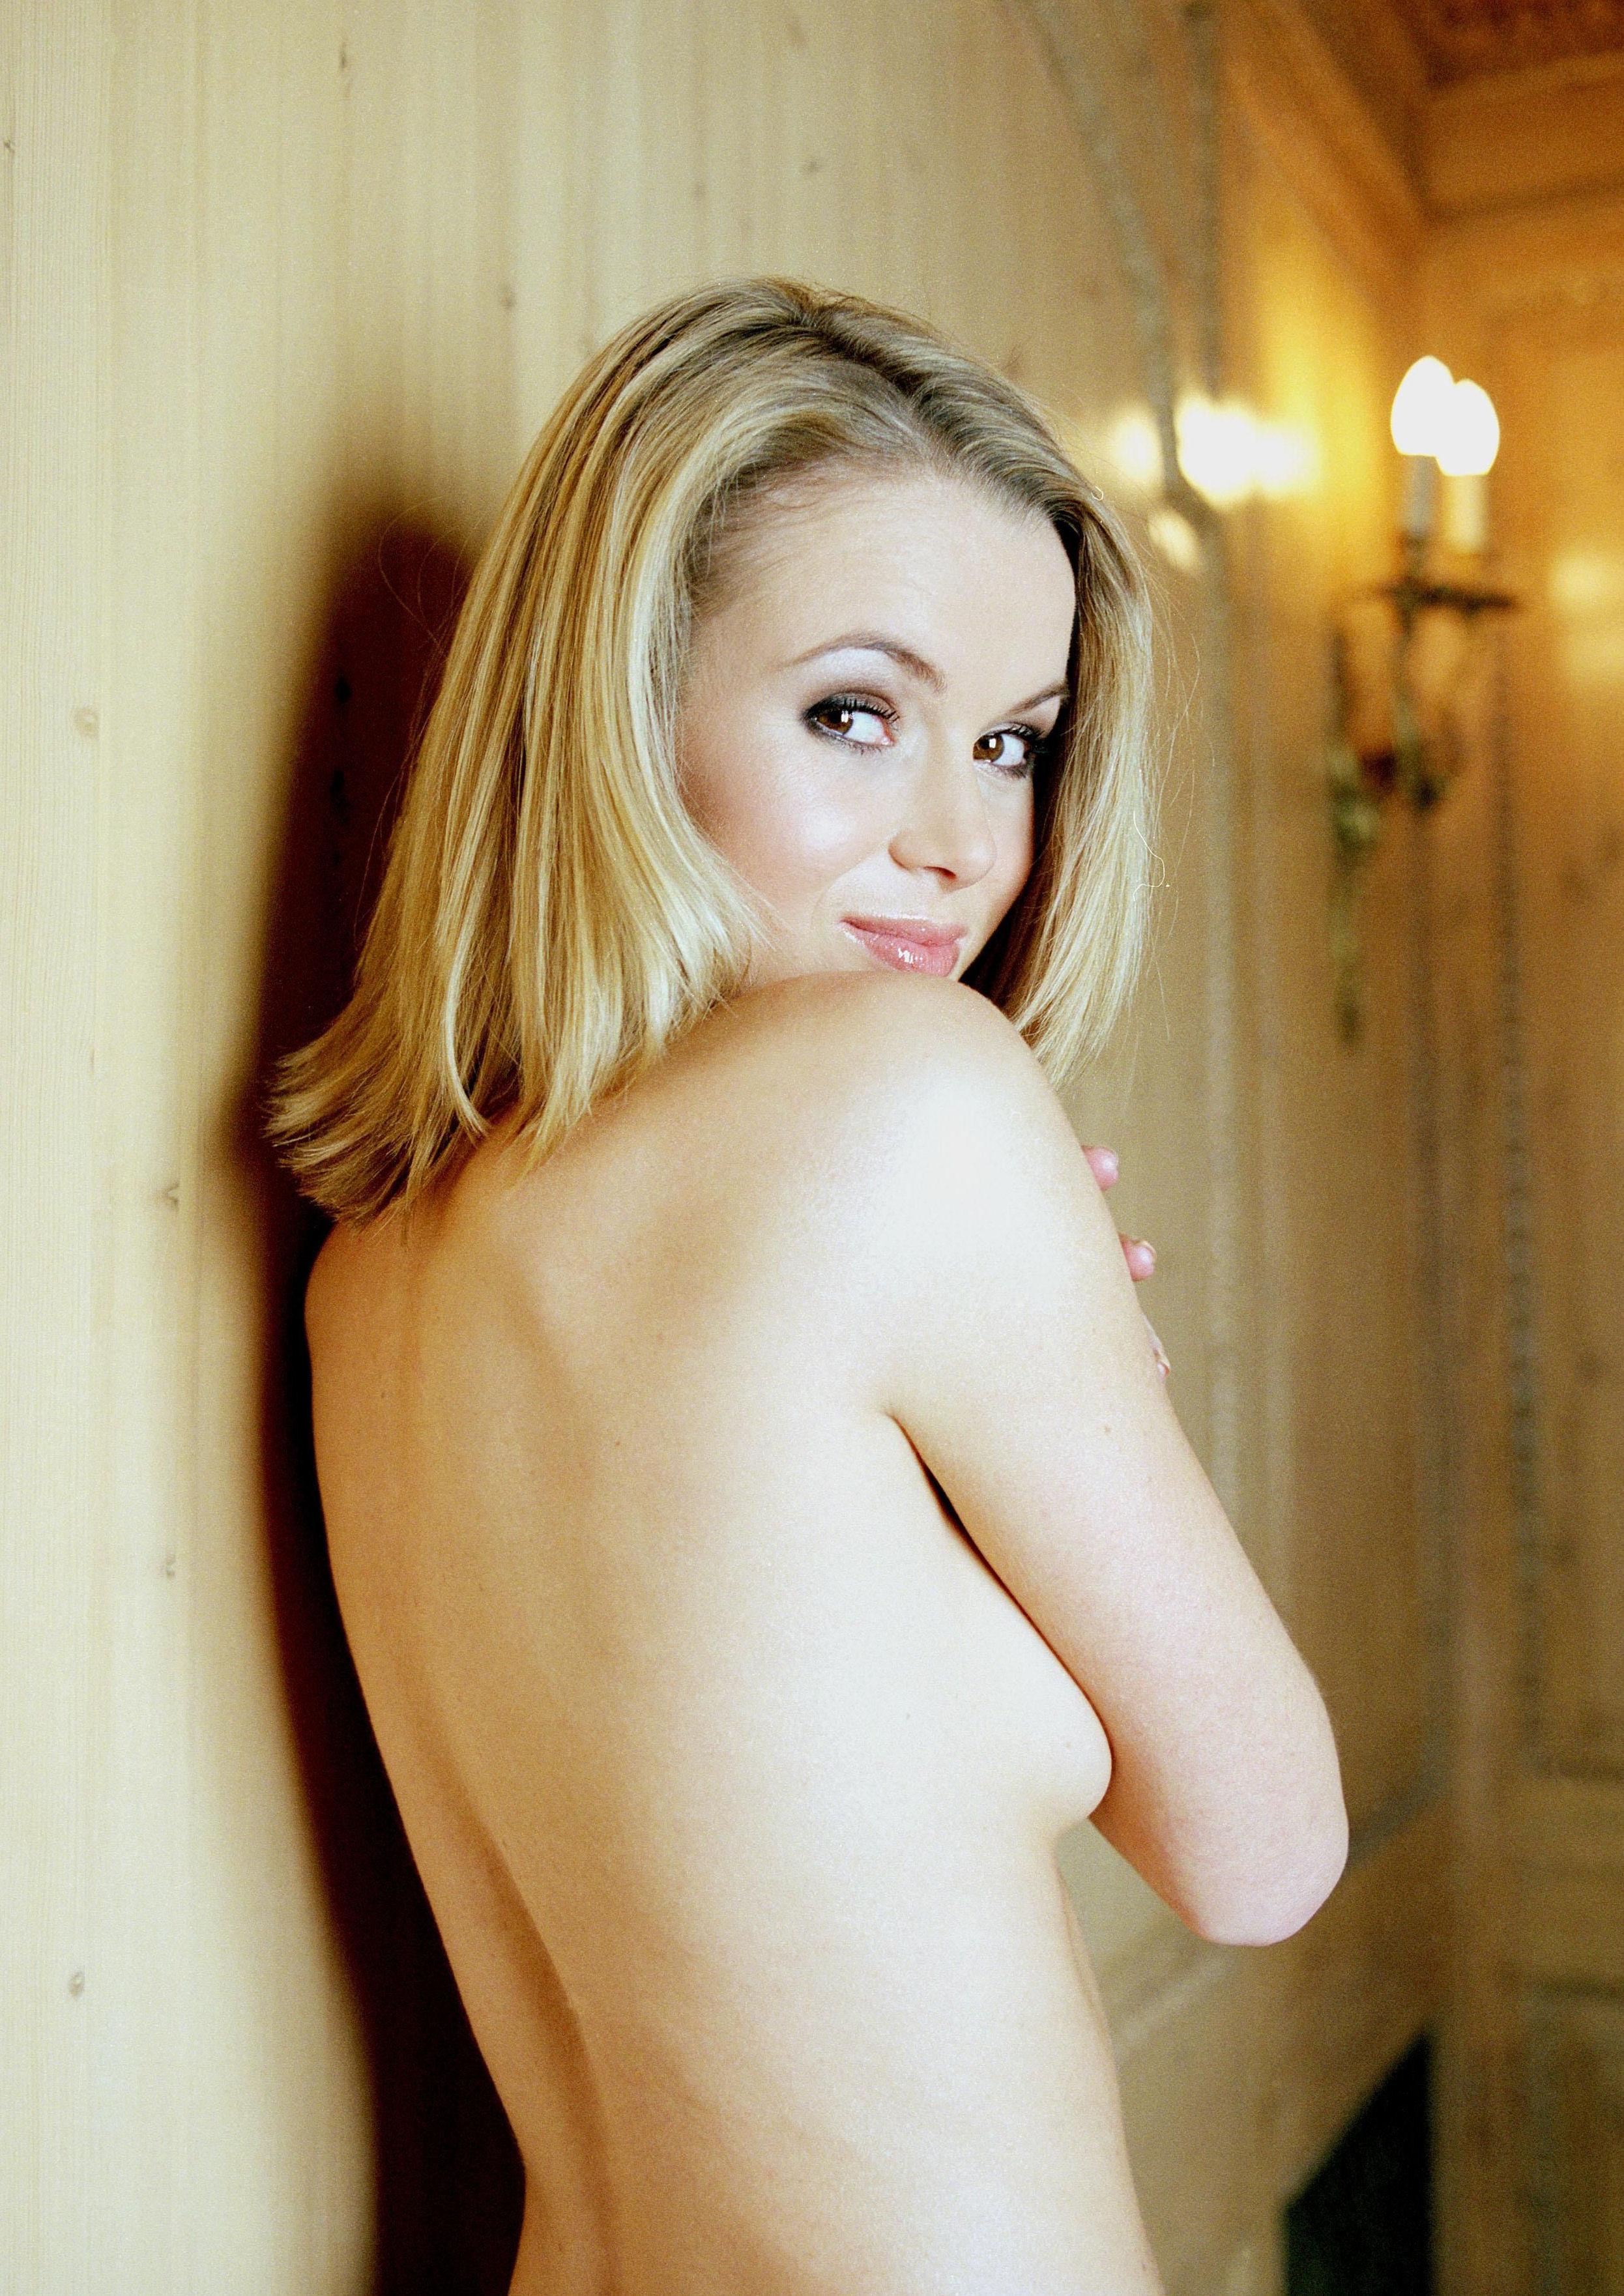 Amanda holden sex scenes, free raunchy sex stories